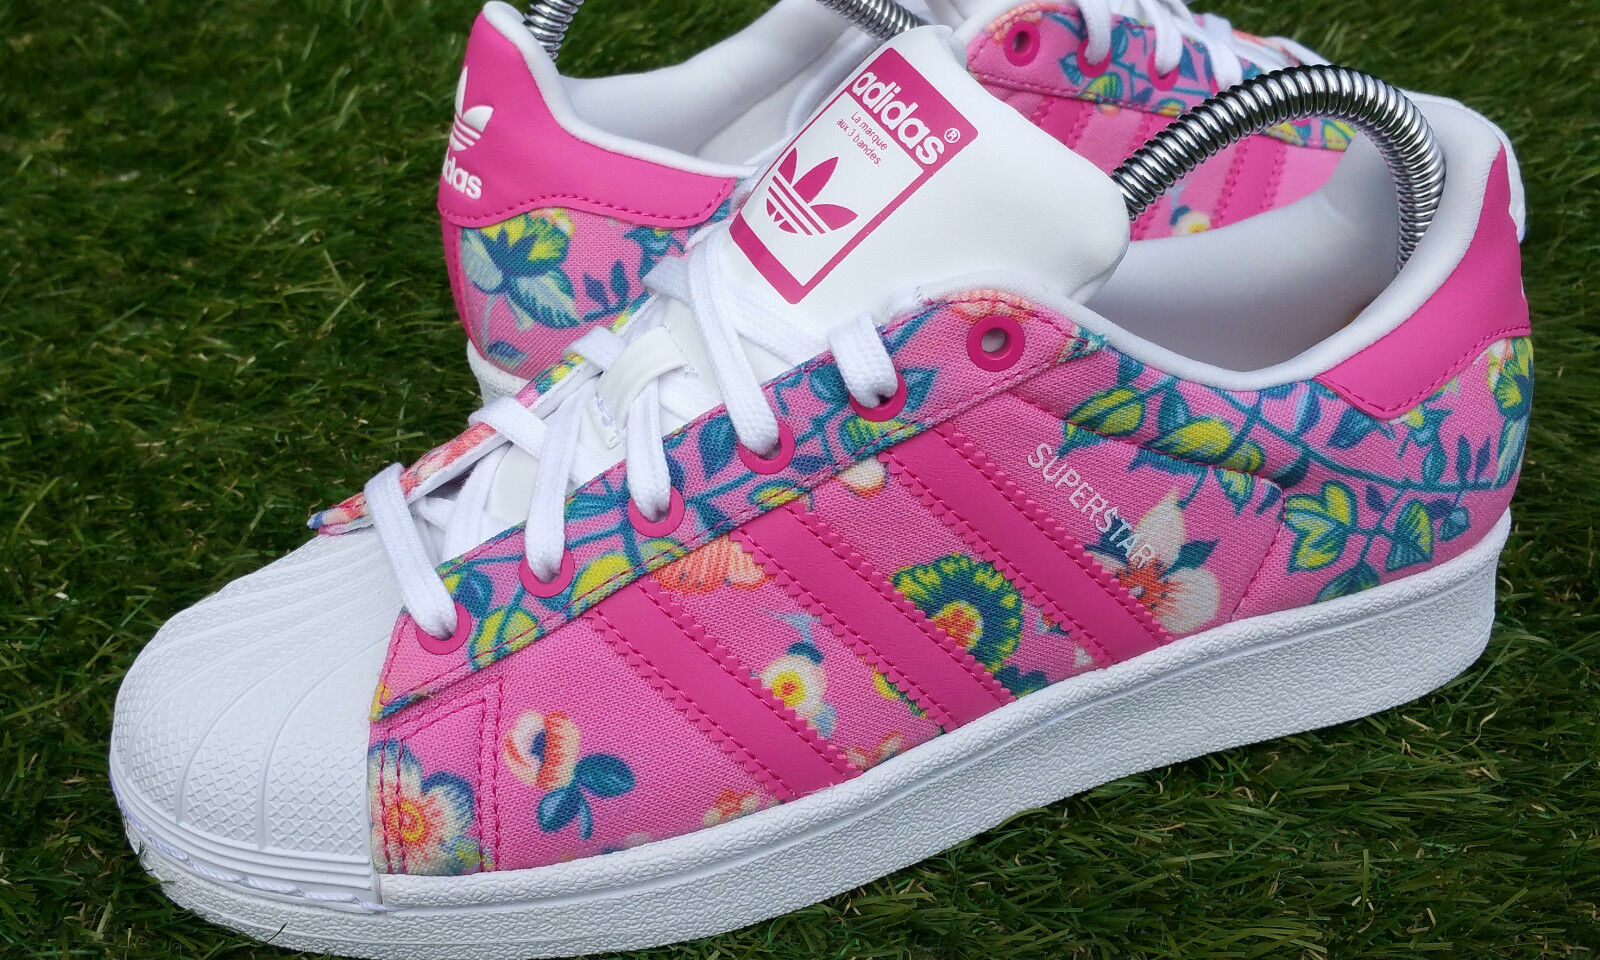 BNWB Superstar & Genuine Adidas Originals & XFarm Company Superstar BNWB Trainers Floral UK 4.5 7767cb